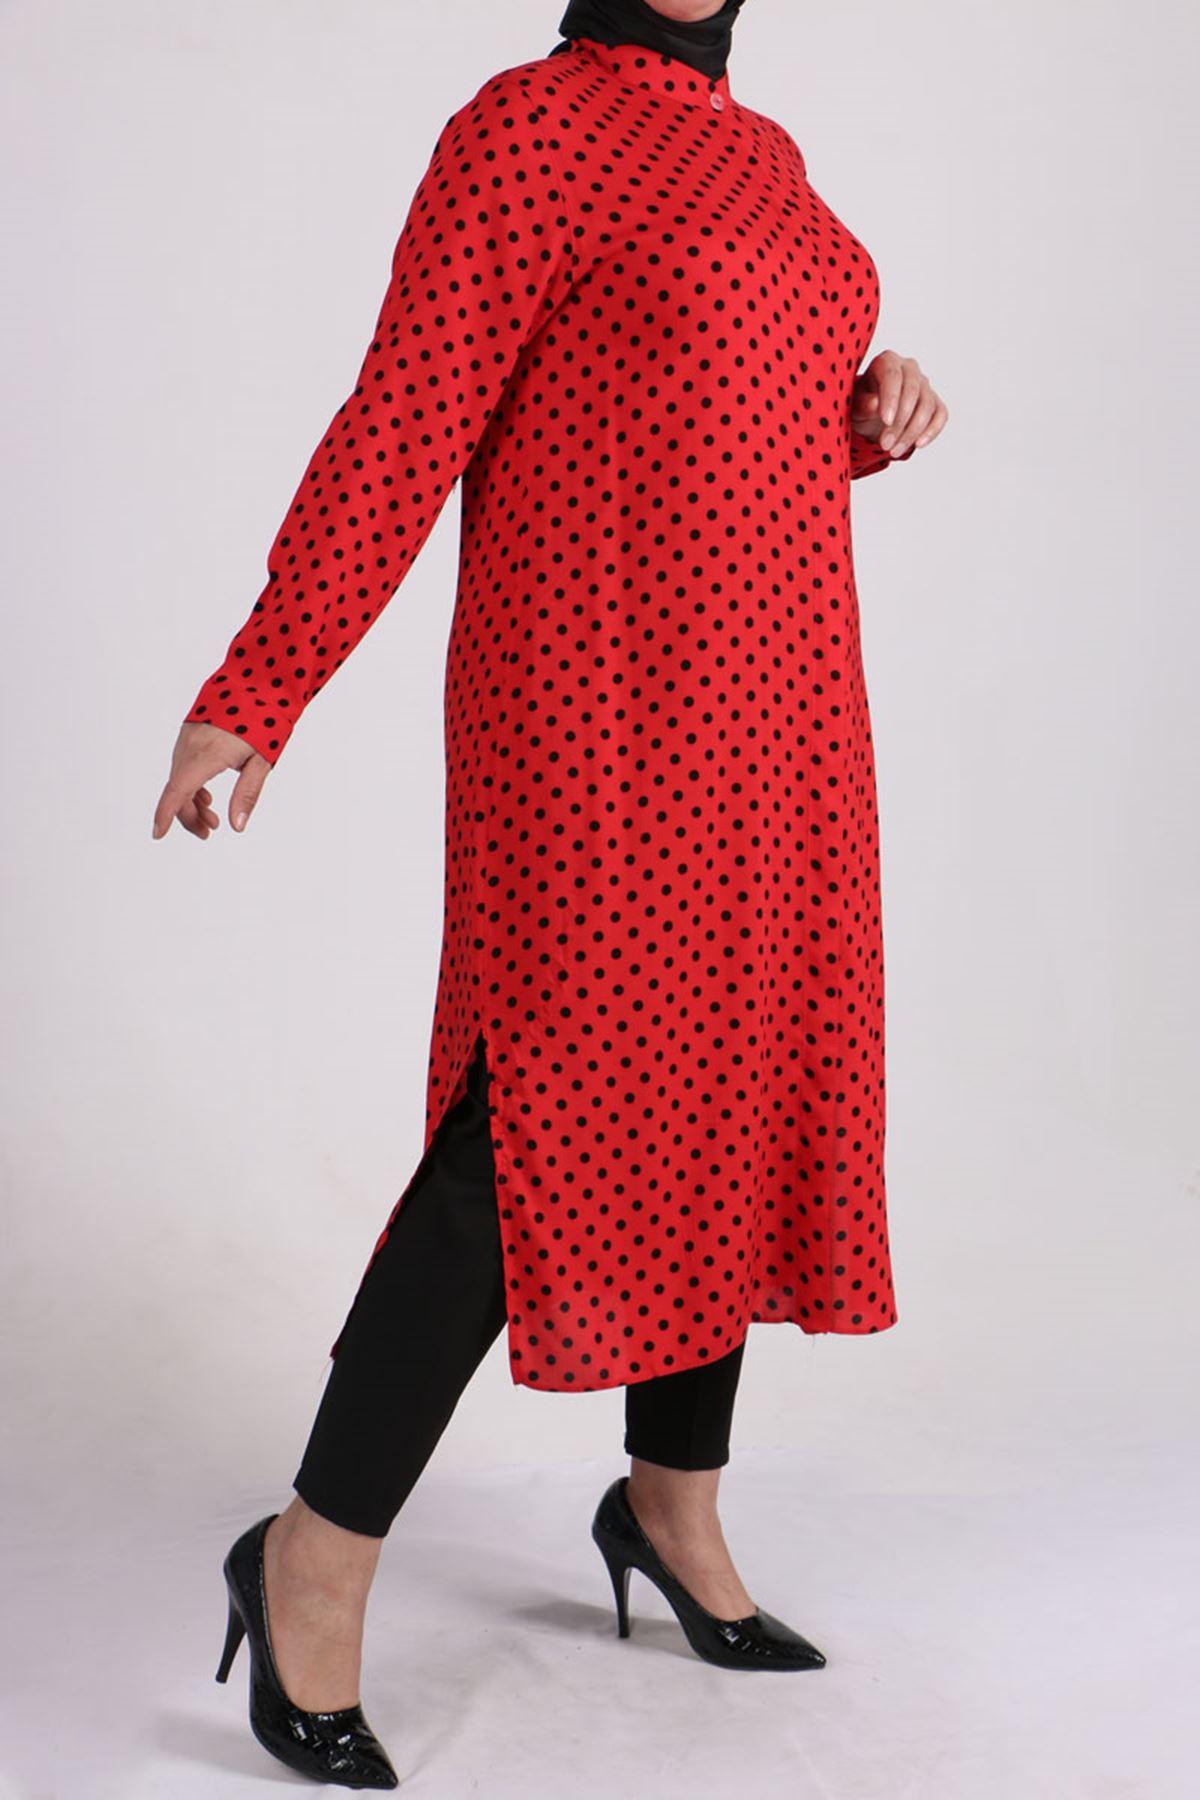 8462 Plus Size Shirt - Red - Black Polka Dot